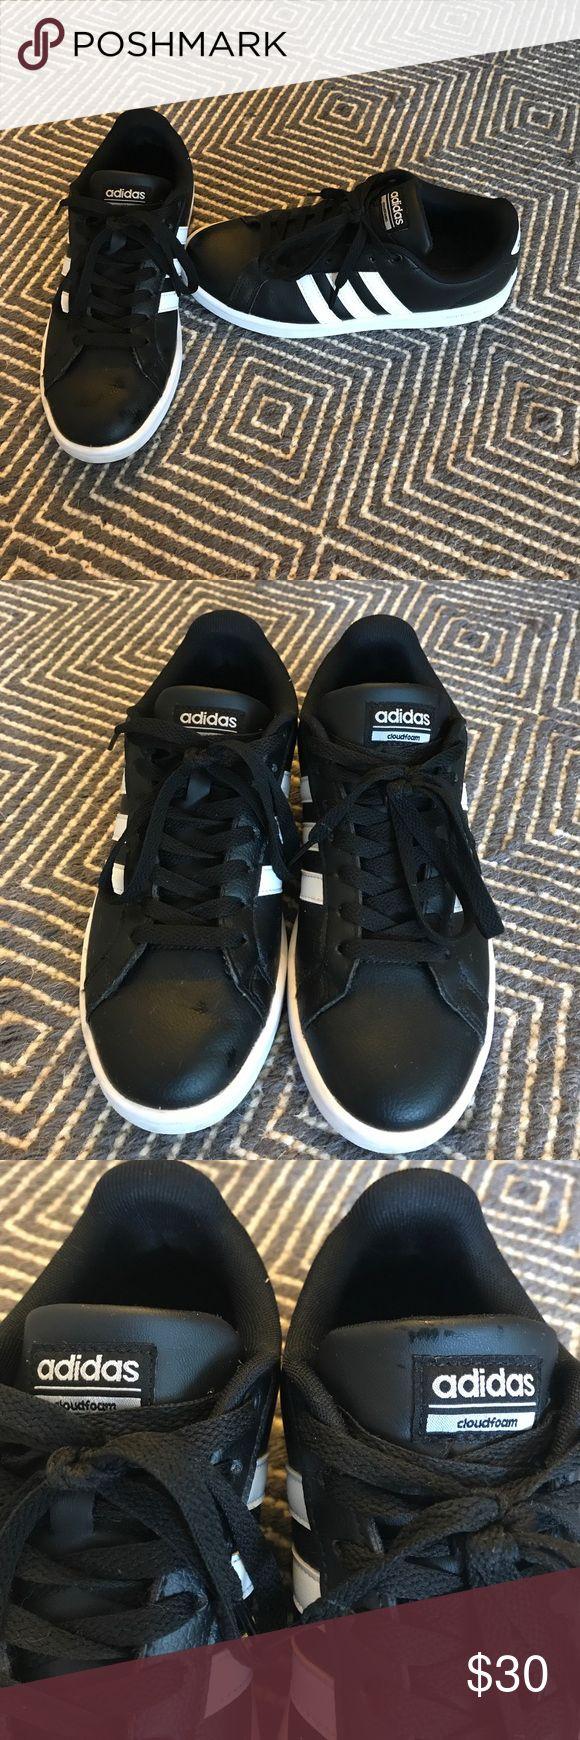 Harga Jual Sepatu Adidas Neo Baseline V2 Original Indonesia Sneaker Vl Court Skate Suede Men Core Black Blk White With Cloud Foam